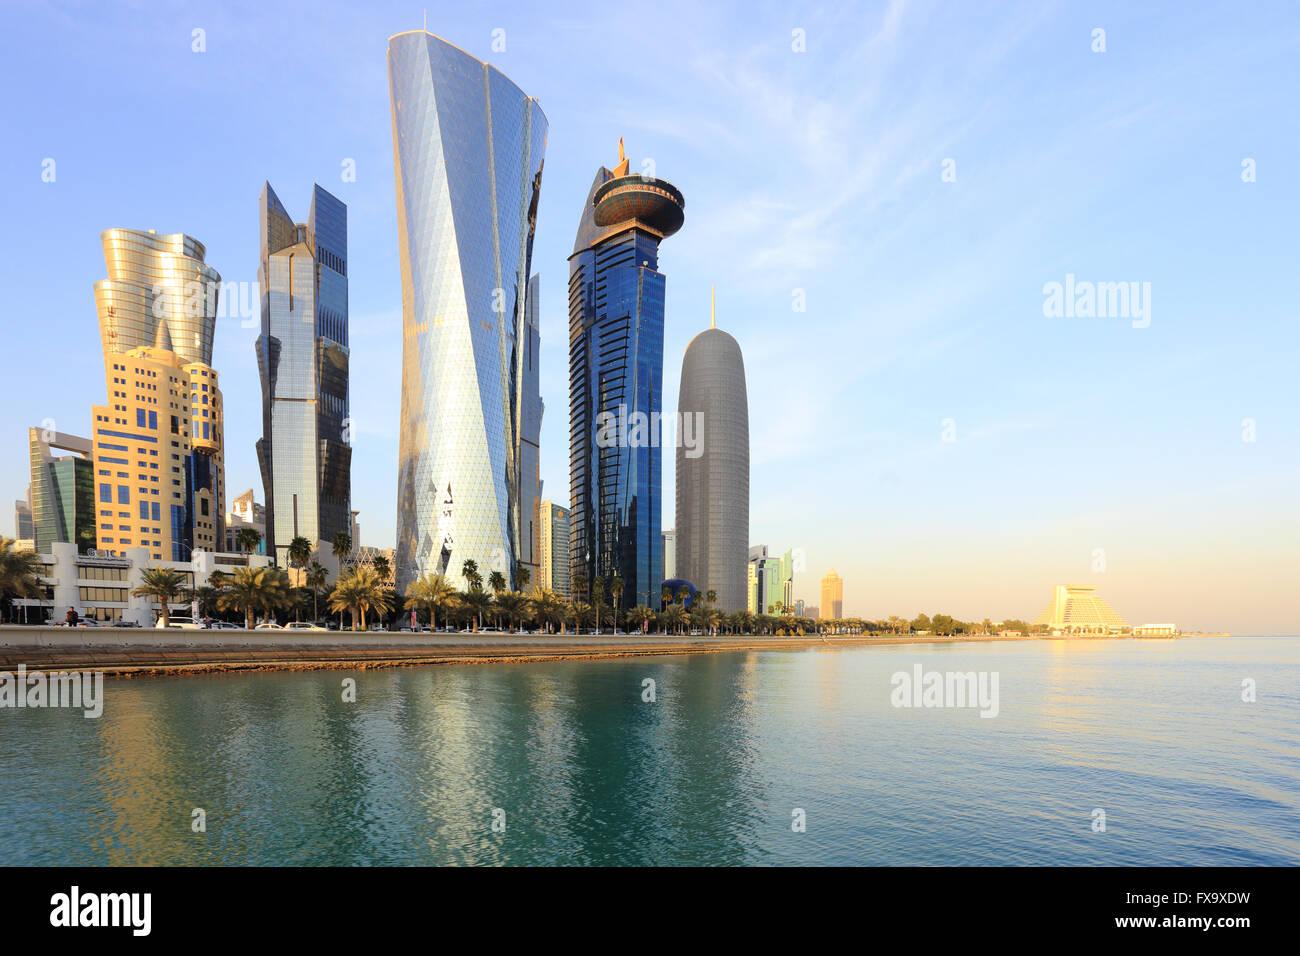 DOHA, QATAR -JANUARY 31, 2016: A view of the towers looming over Doha Bay. - Stock Image